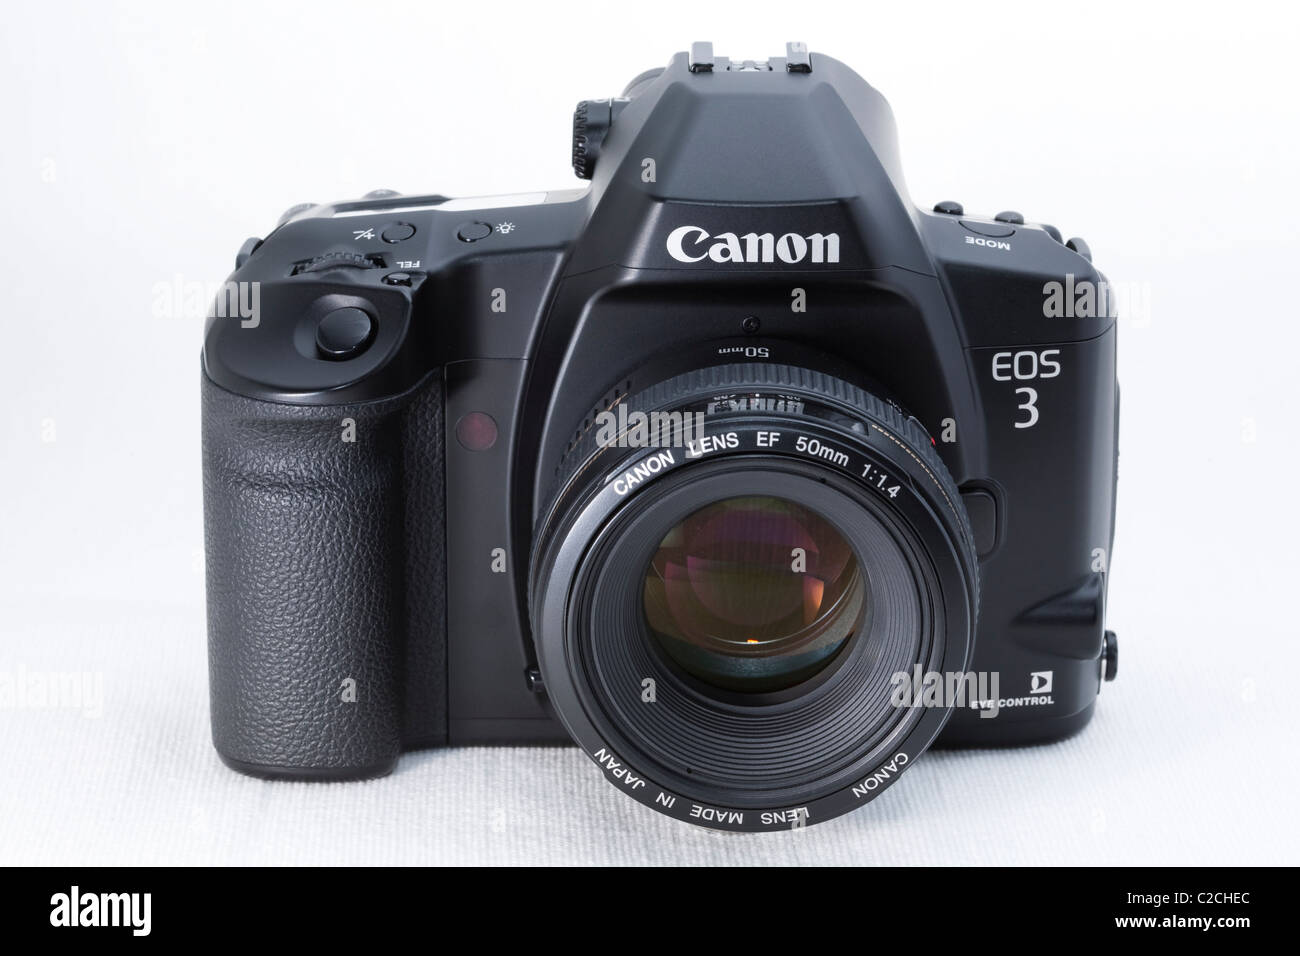 A 35mm film SLR camera. - Stock Image